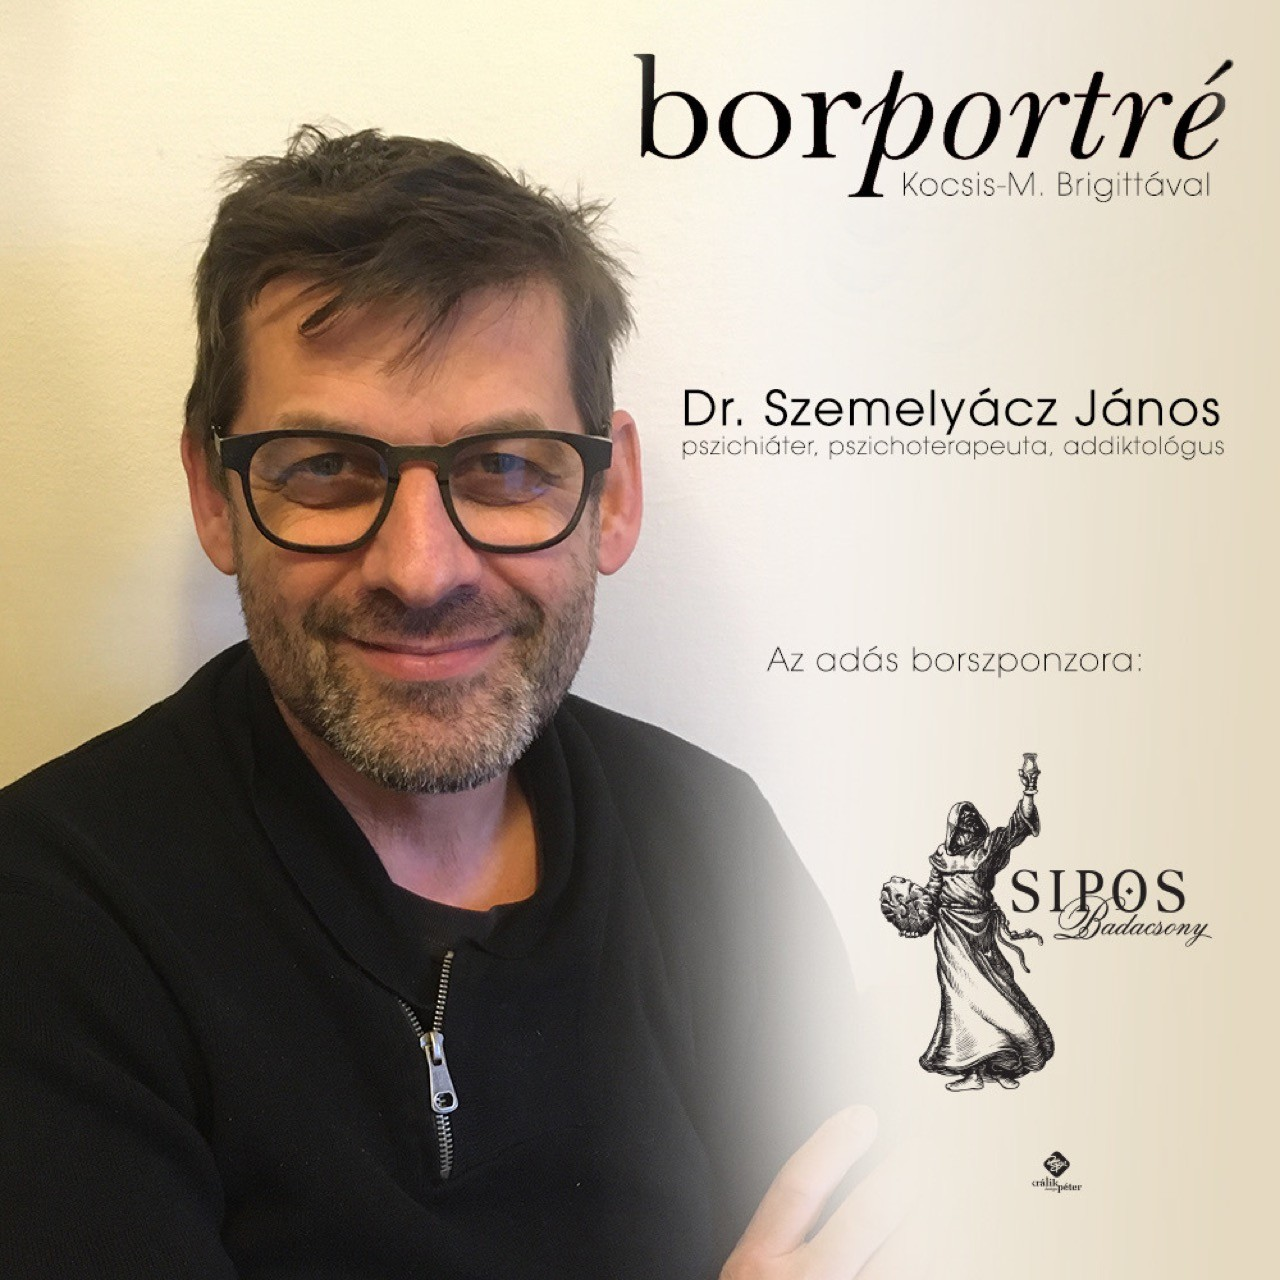 borportre_2020_12_09_Dr_Szemelyacz_Janos_addiktologus_sipos_kocka 2